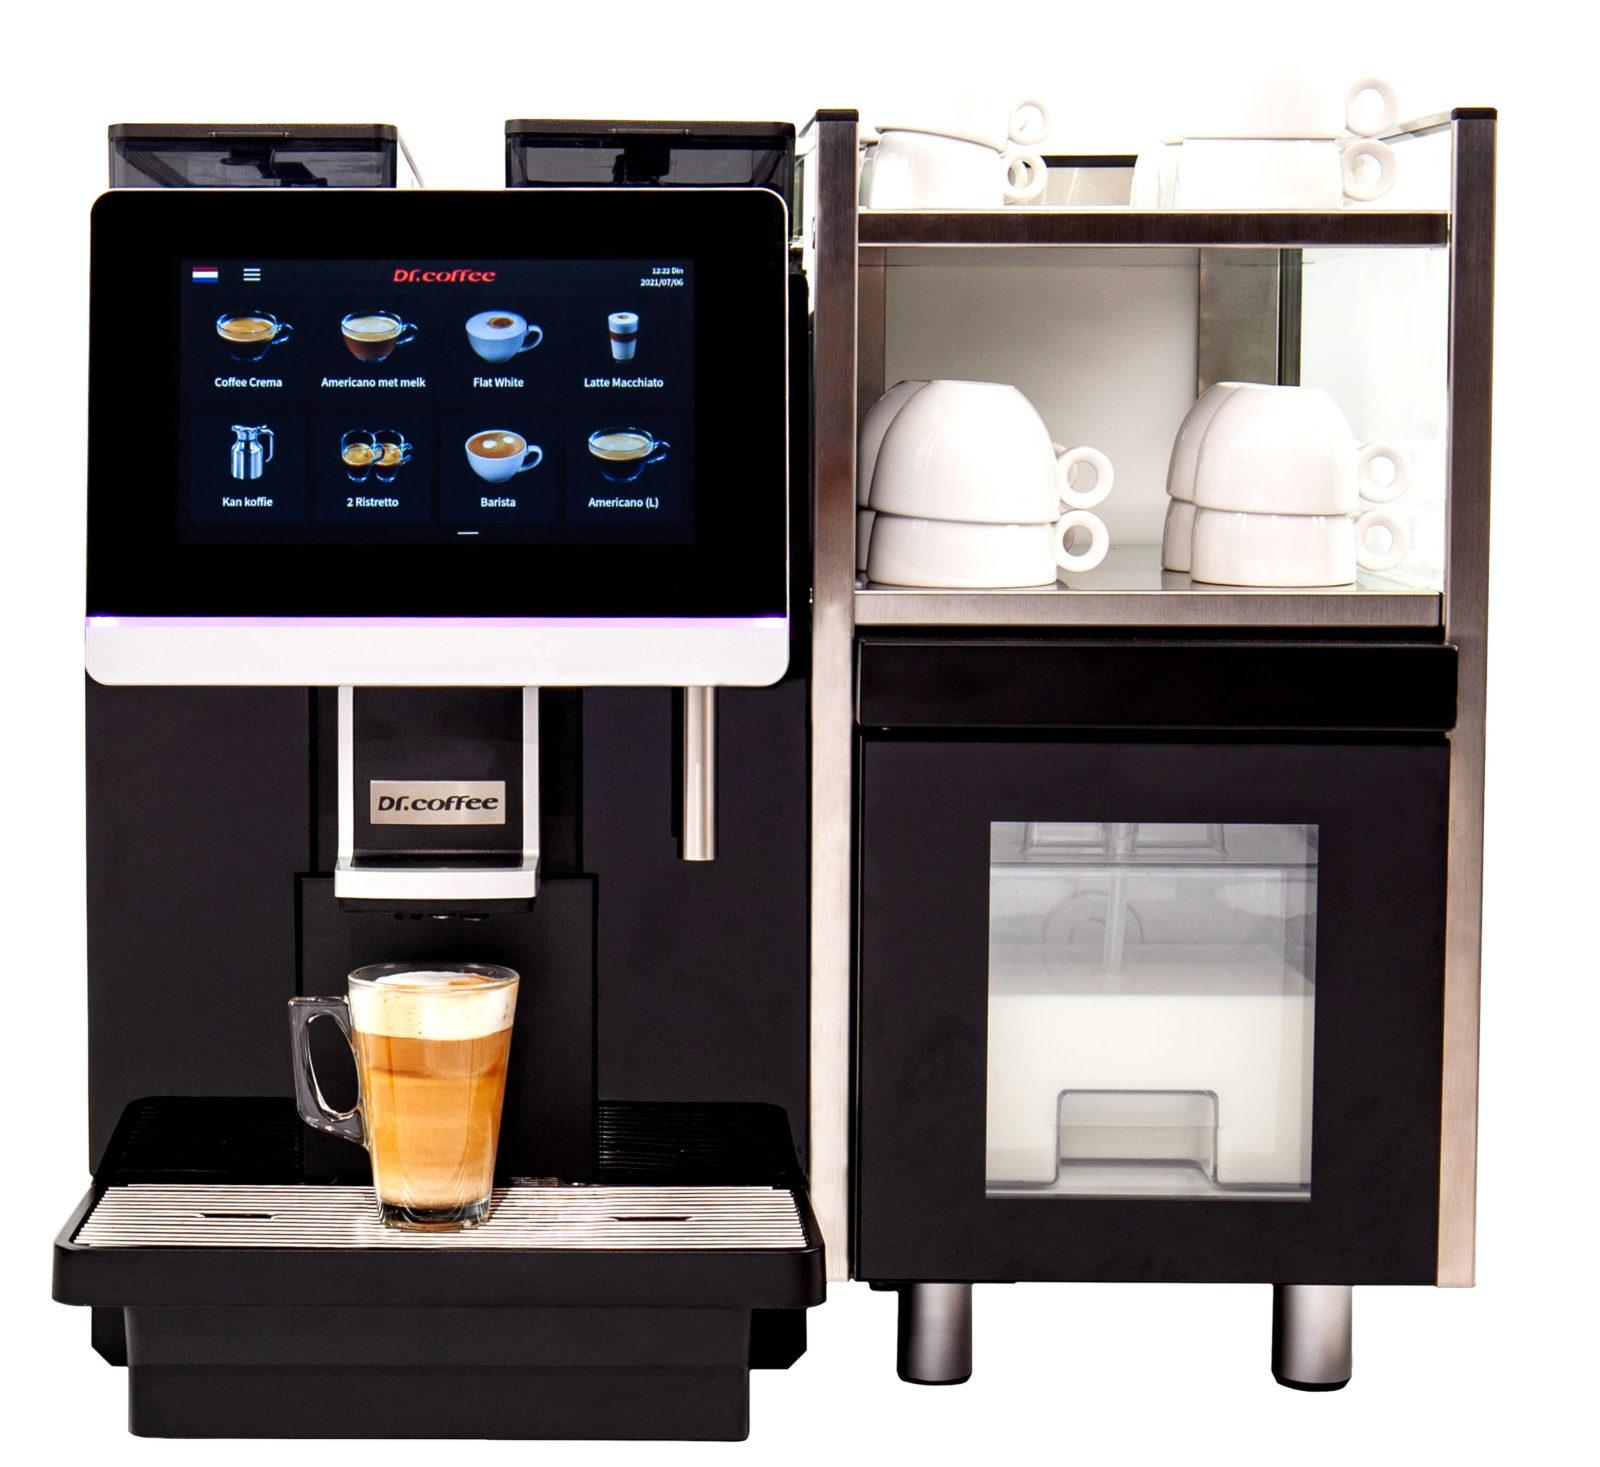 Dr. Coffee Coffeebar Plus - Coffee@Work: Koffie en koffieautomaten voor bedrijven